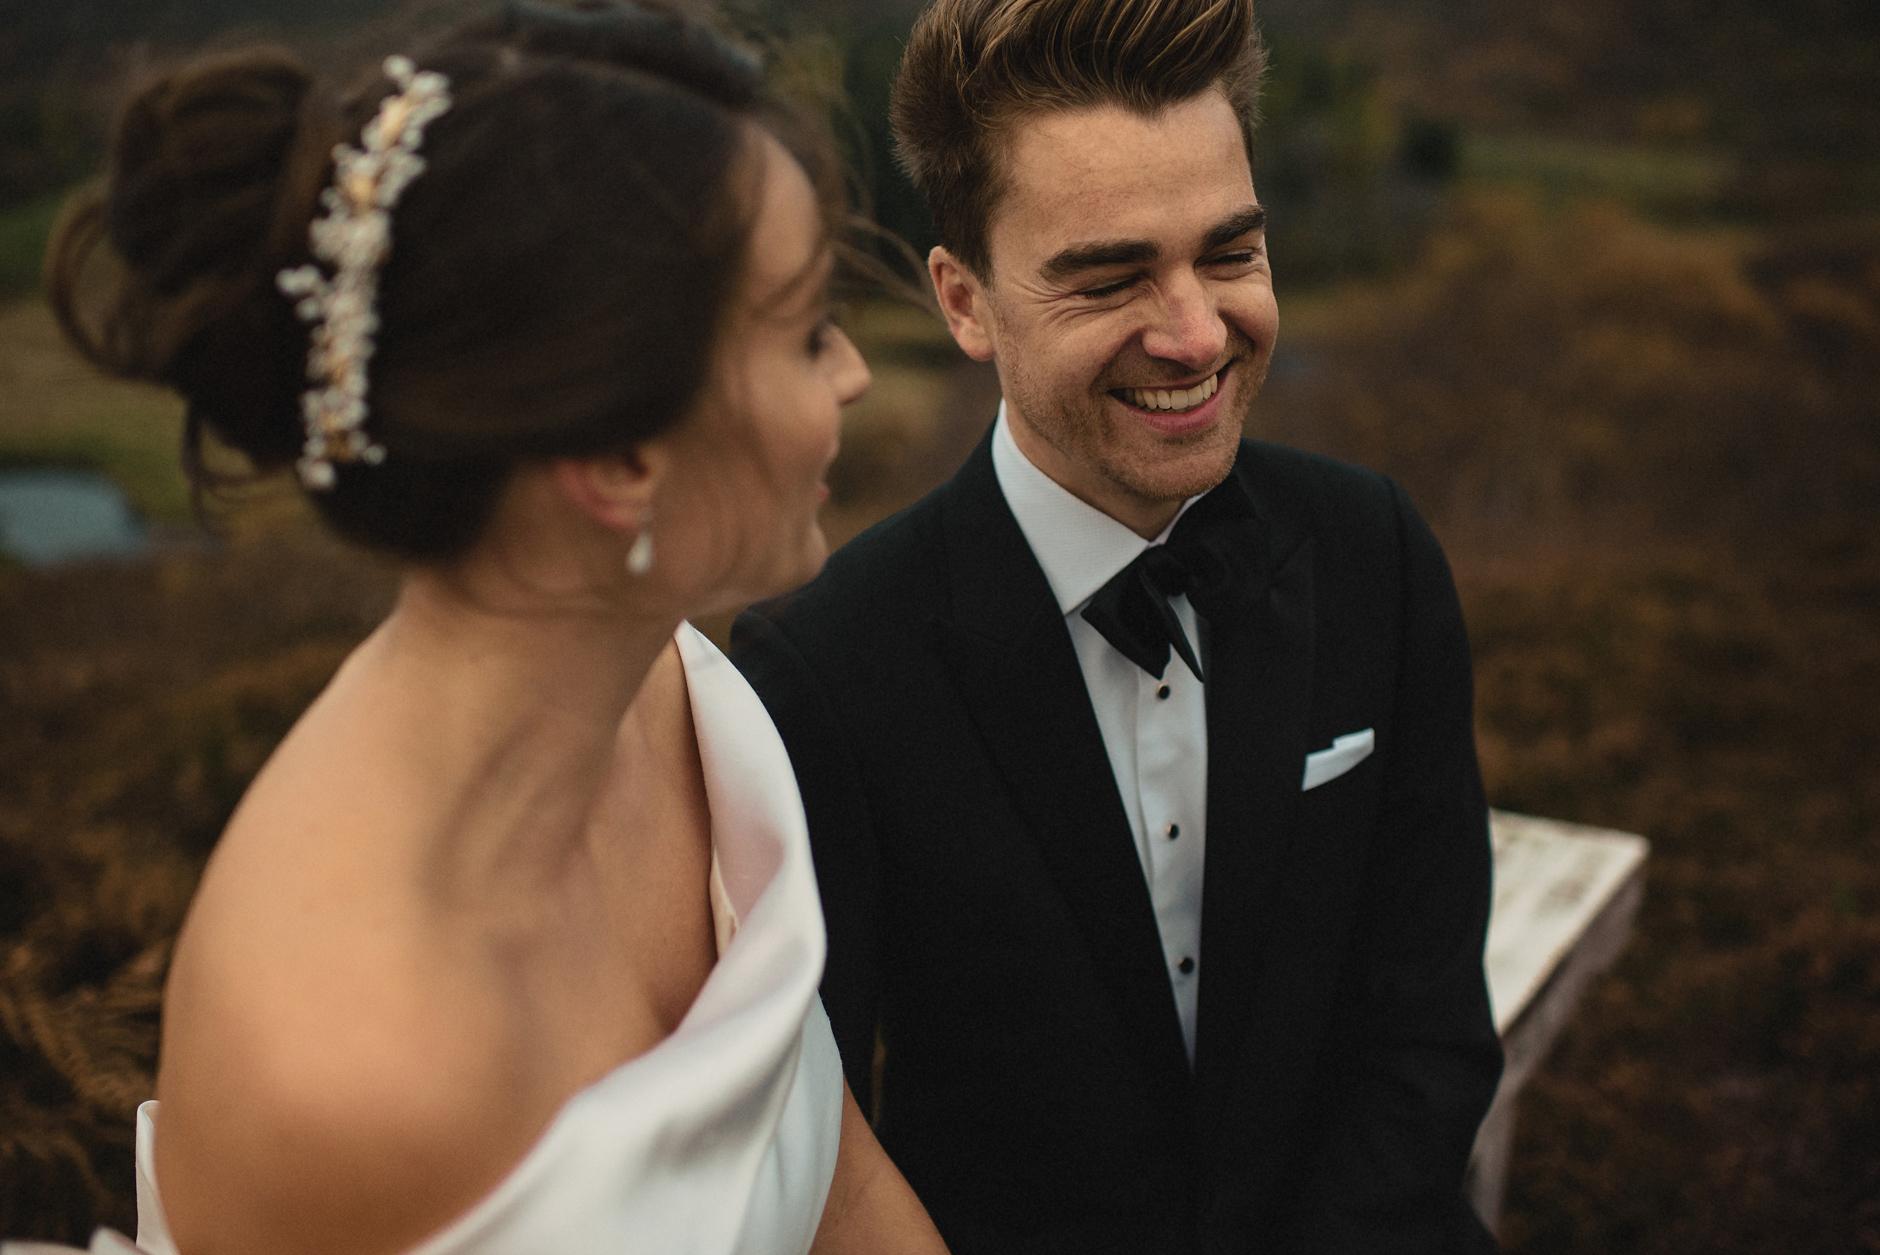 Glentruim-Wedding-Nikki-Leadbetter-Photography-177.jpg